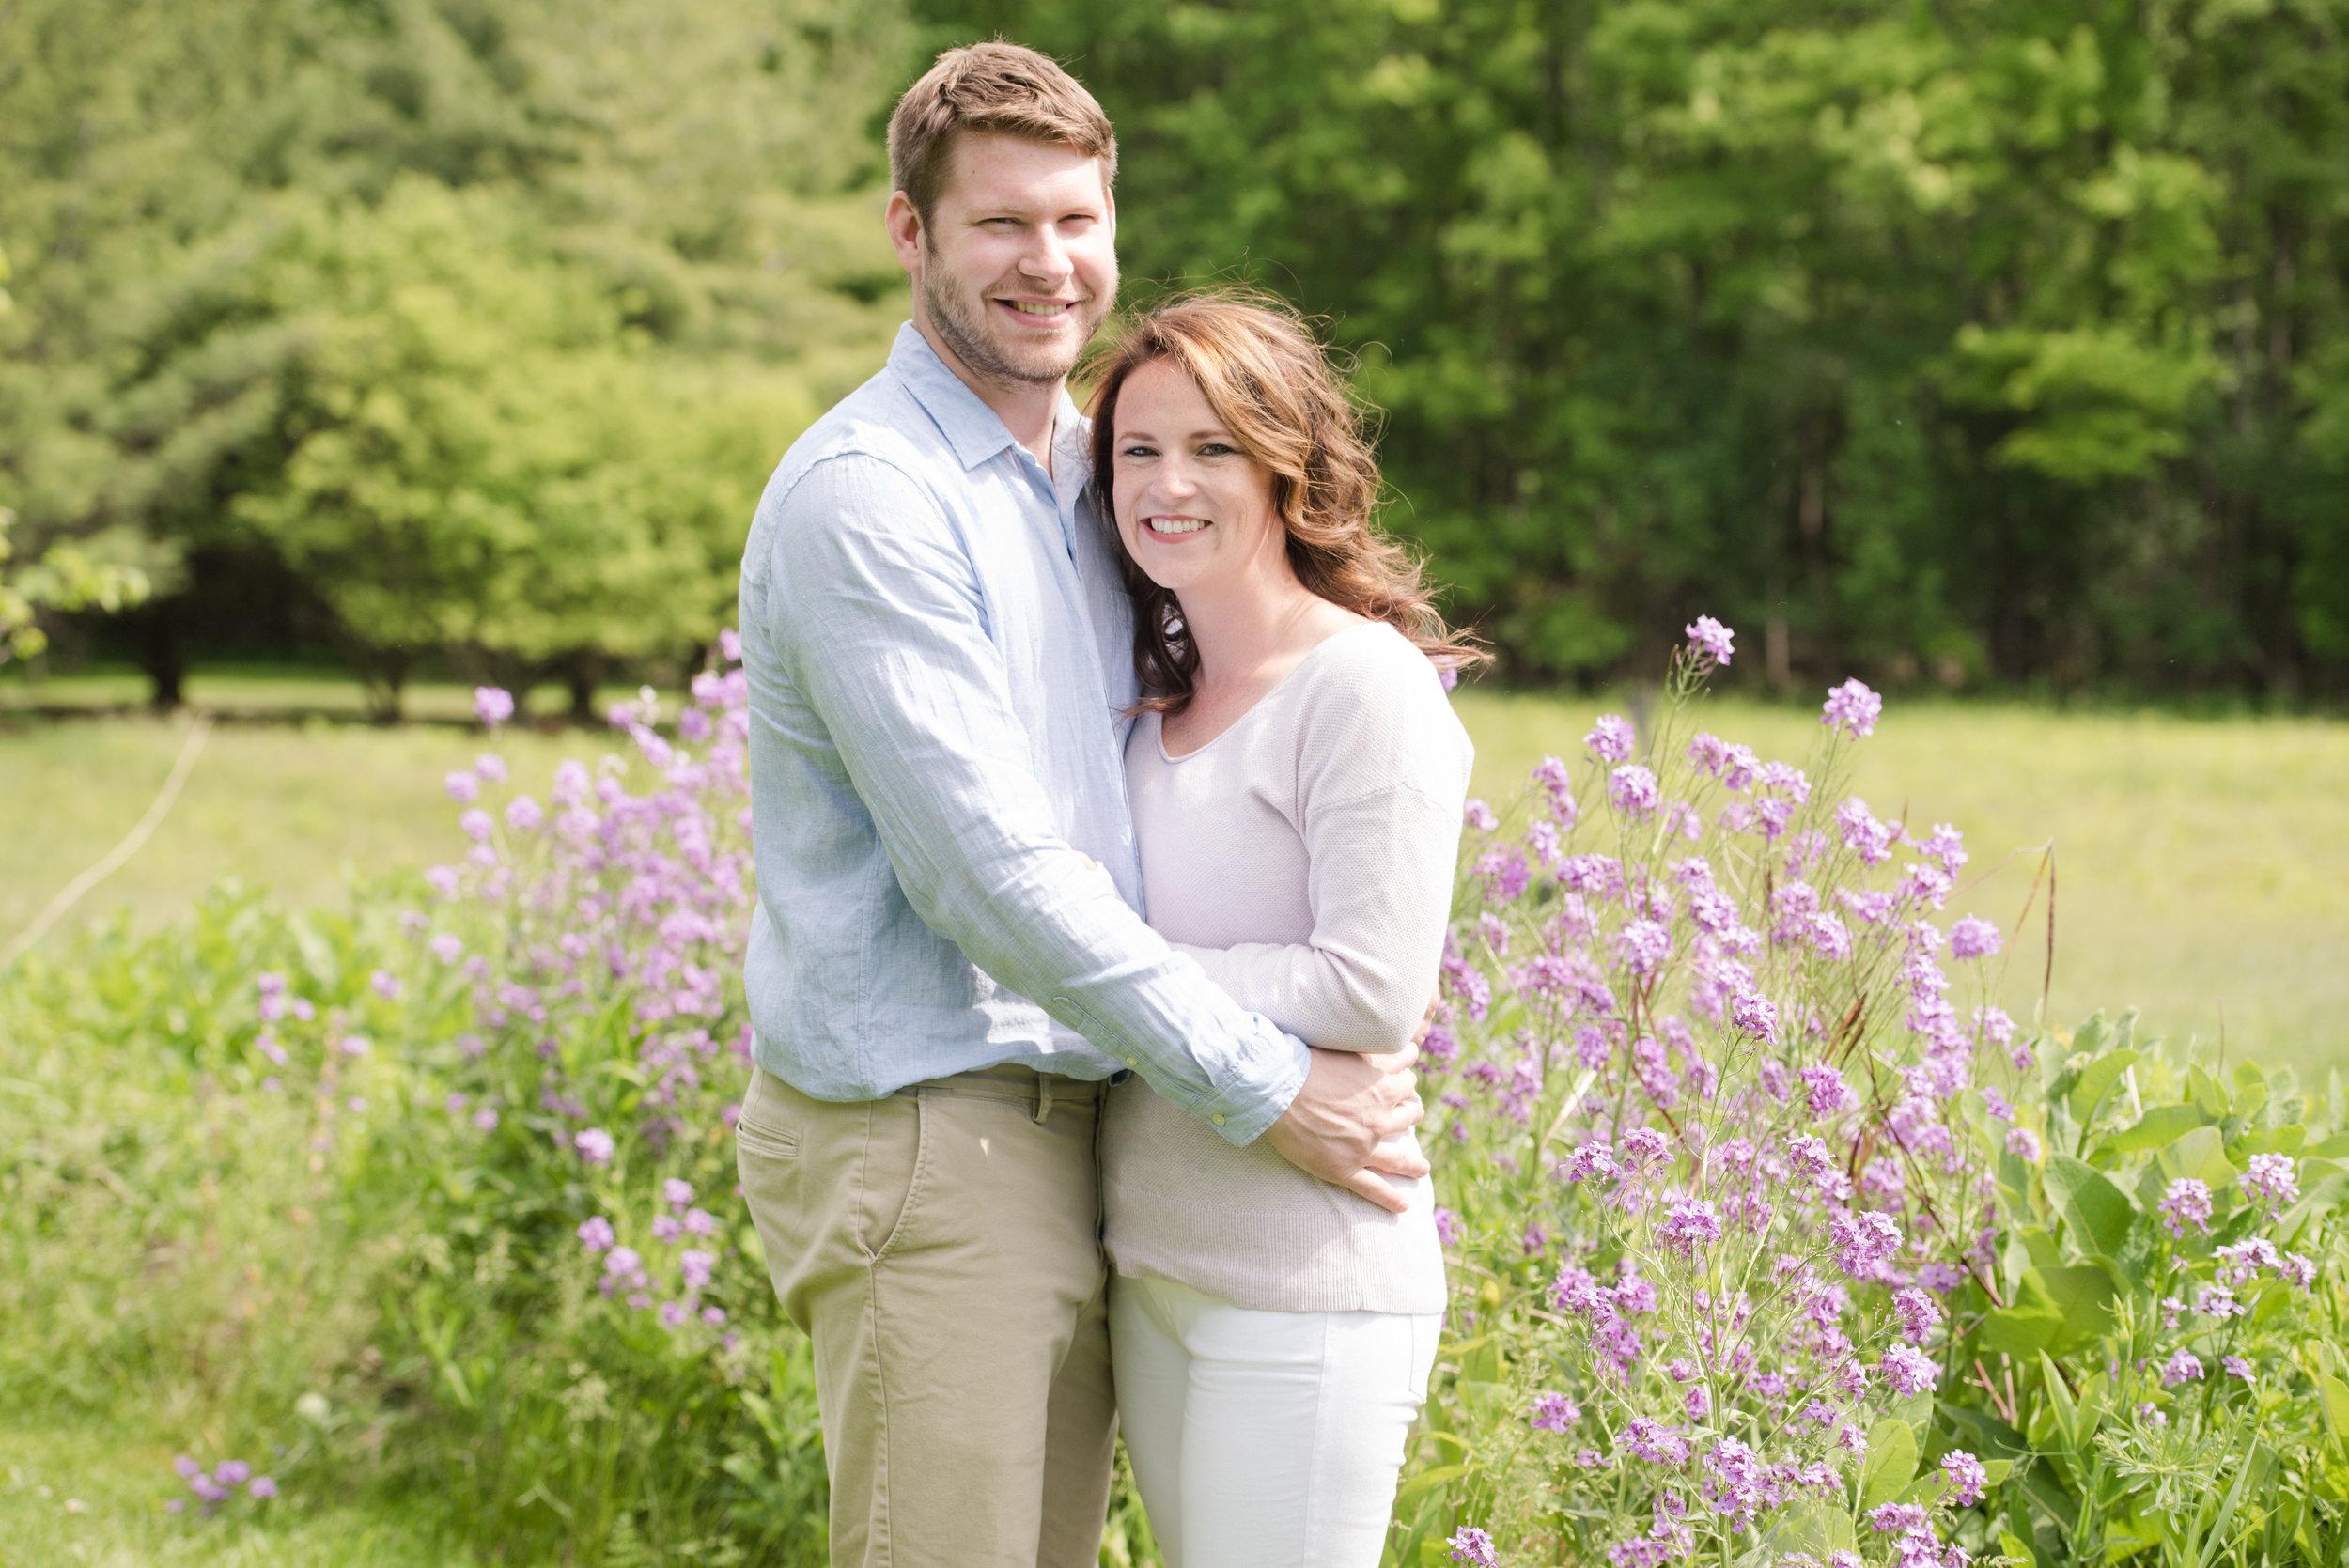 GALLERY-2019-6-9 Kaitlin, Justin & Liam Engagement 0264 15.jpg